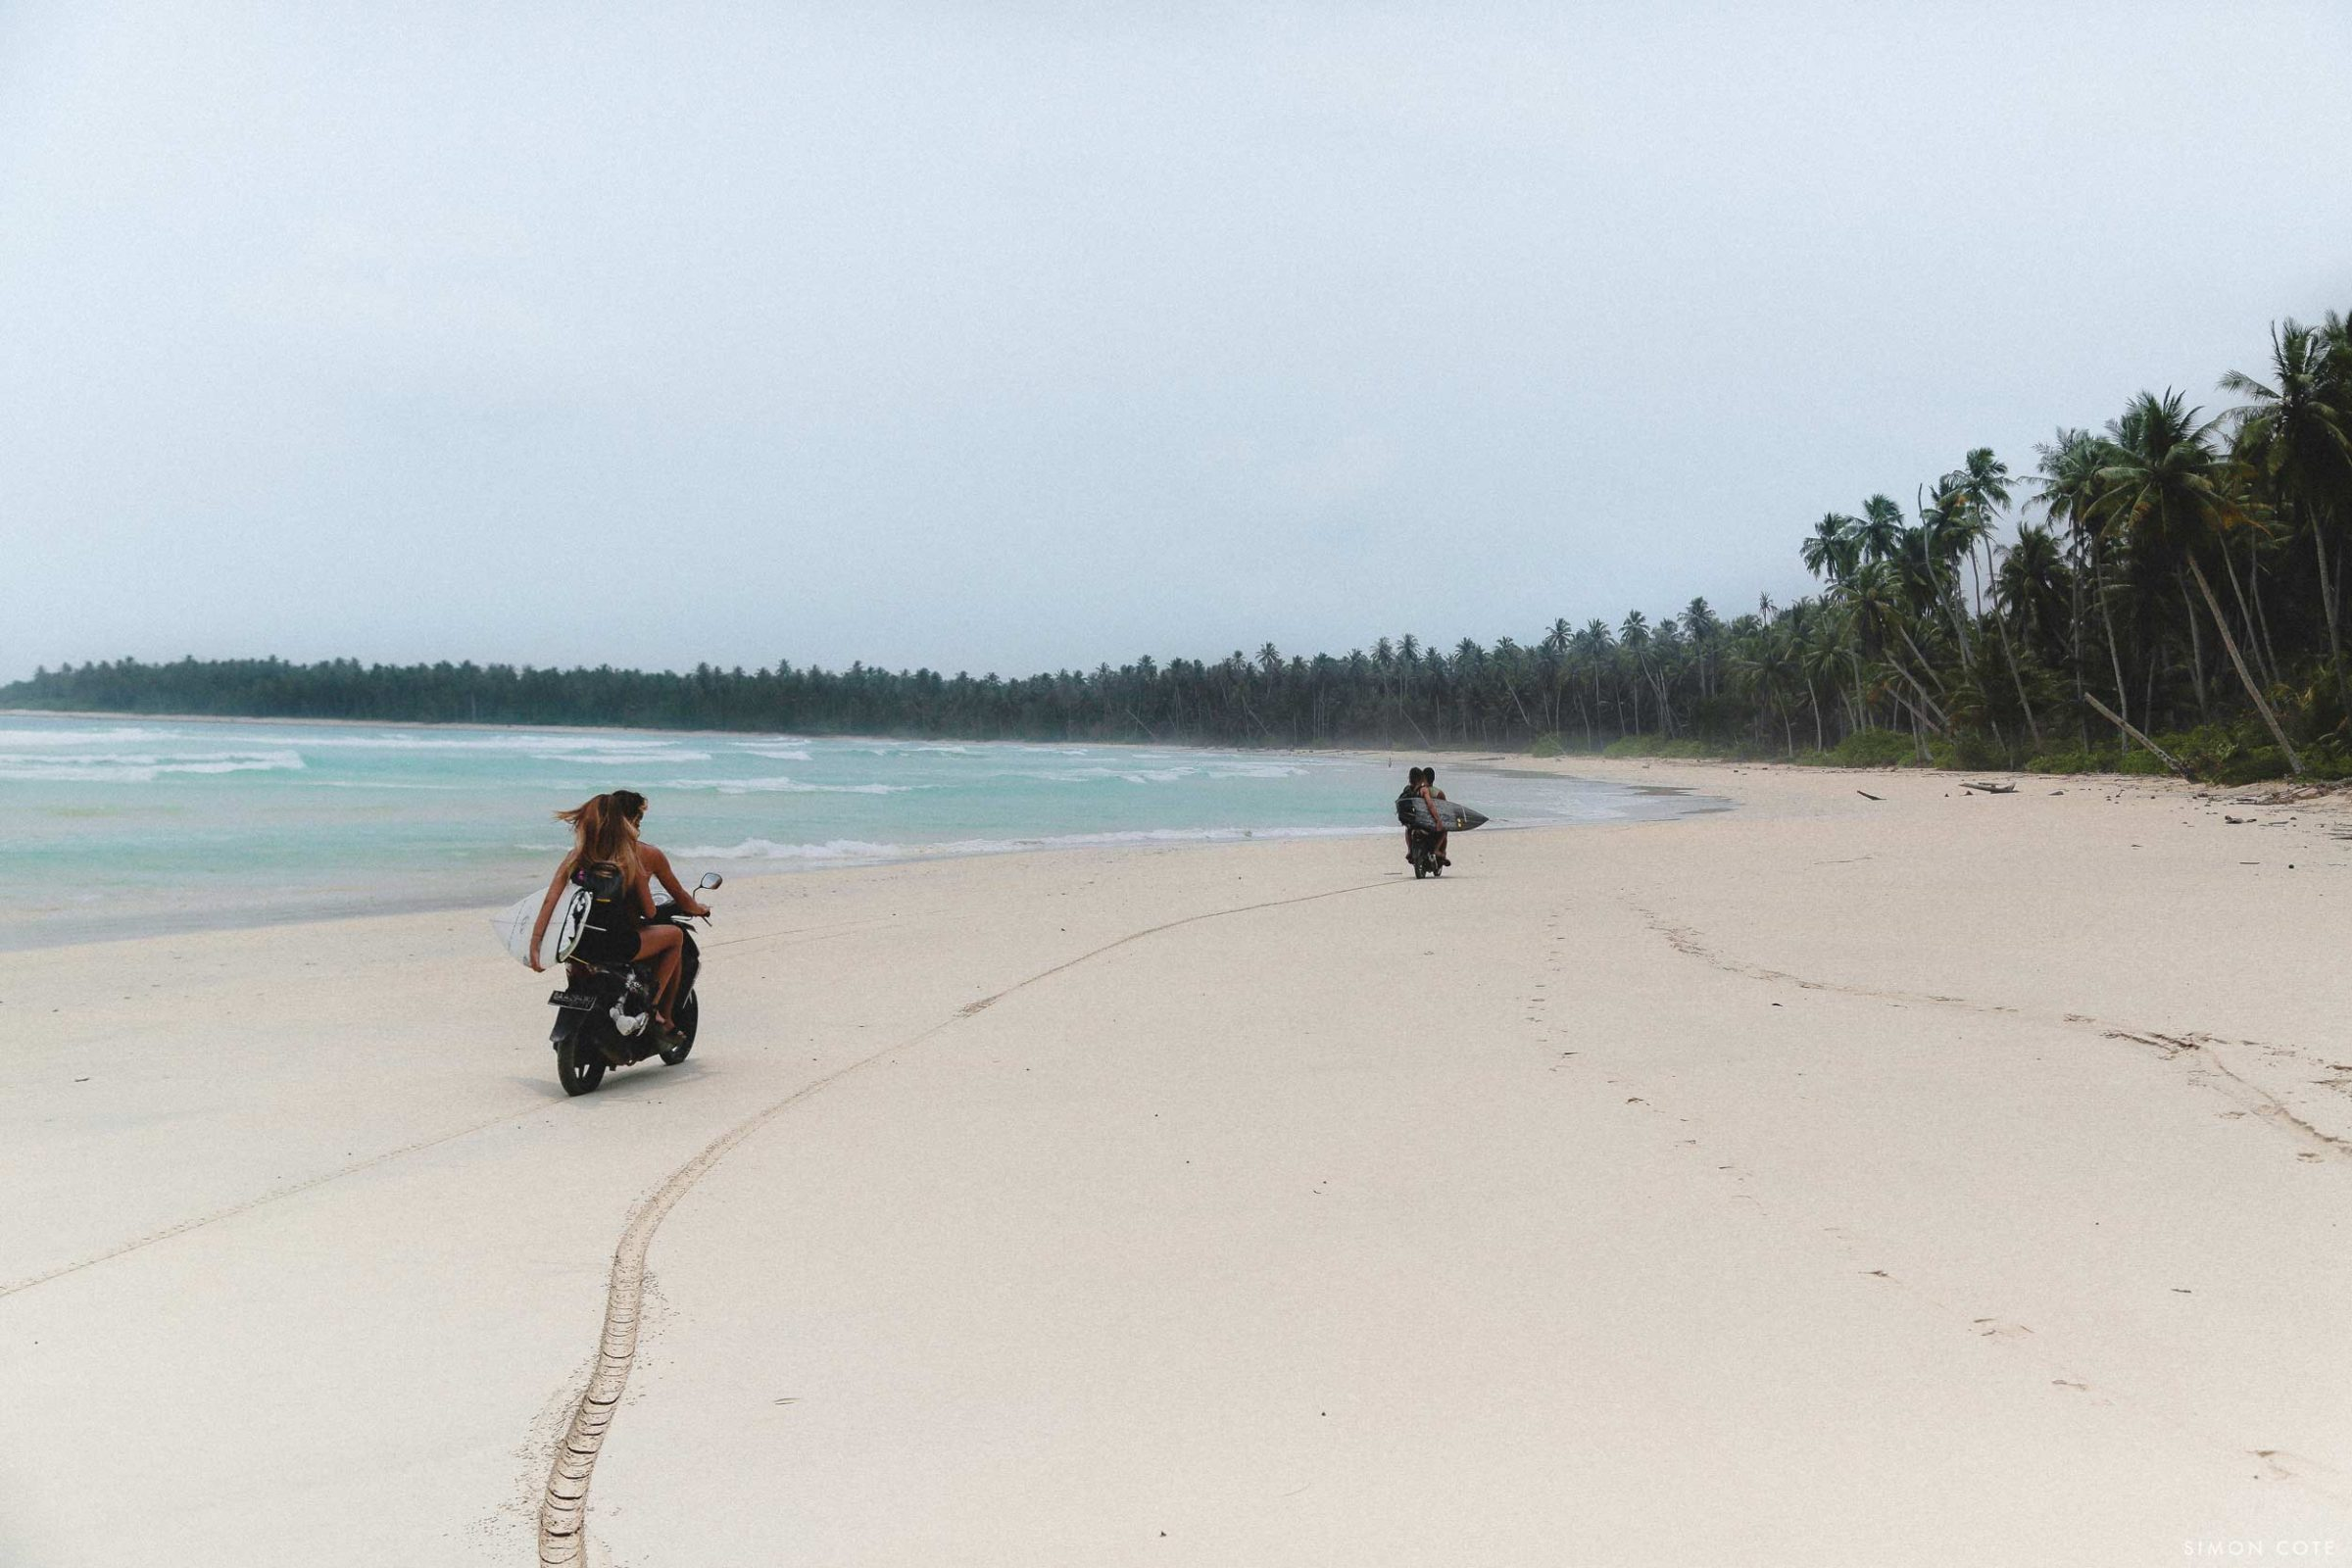 Beach-Motorcycle